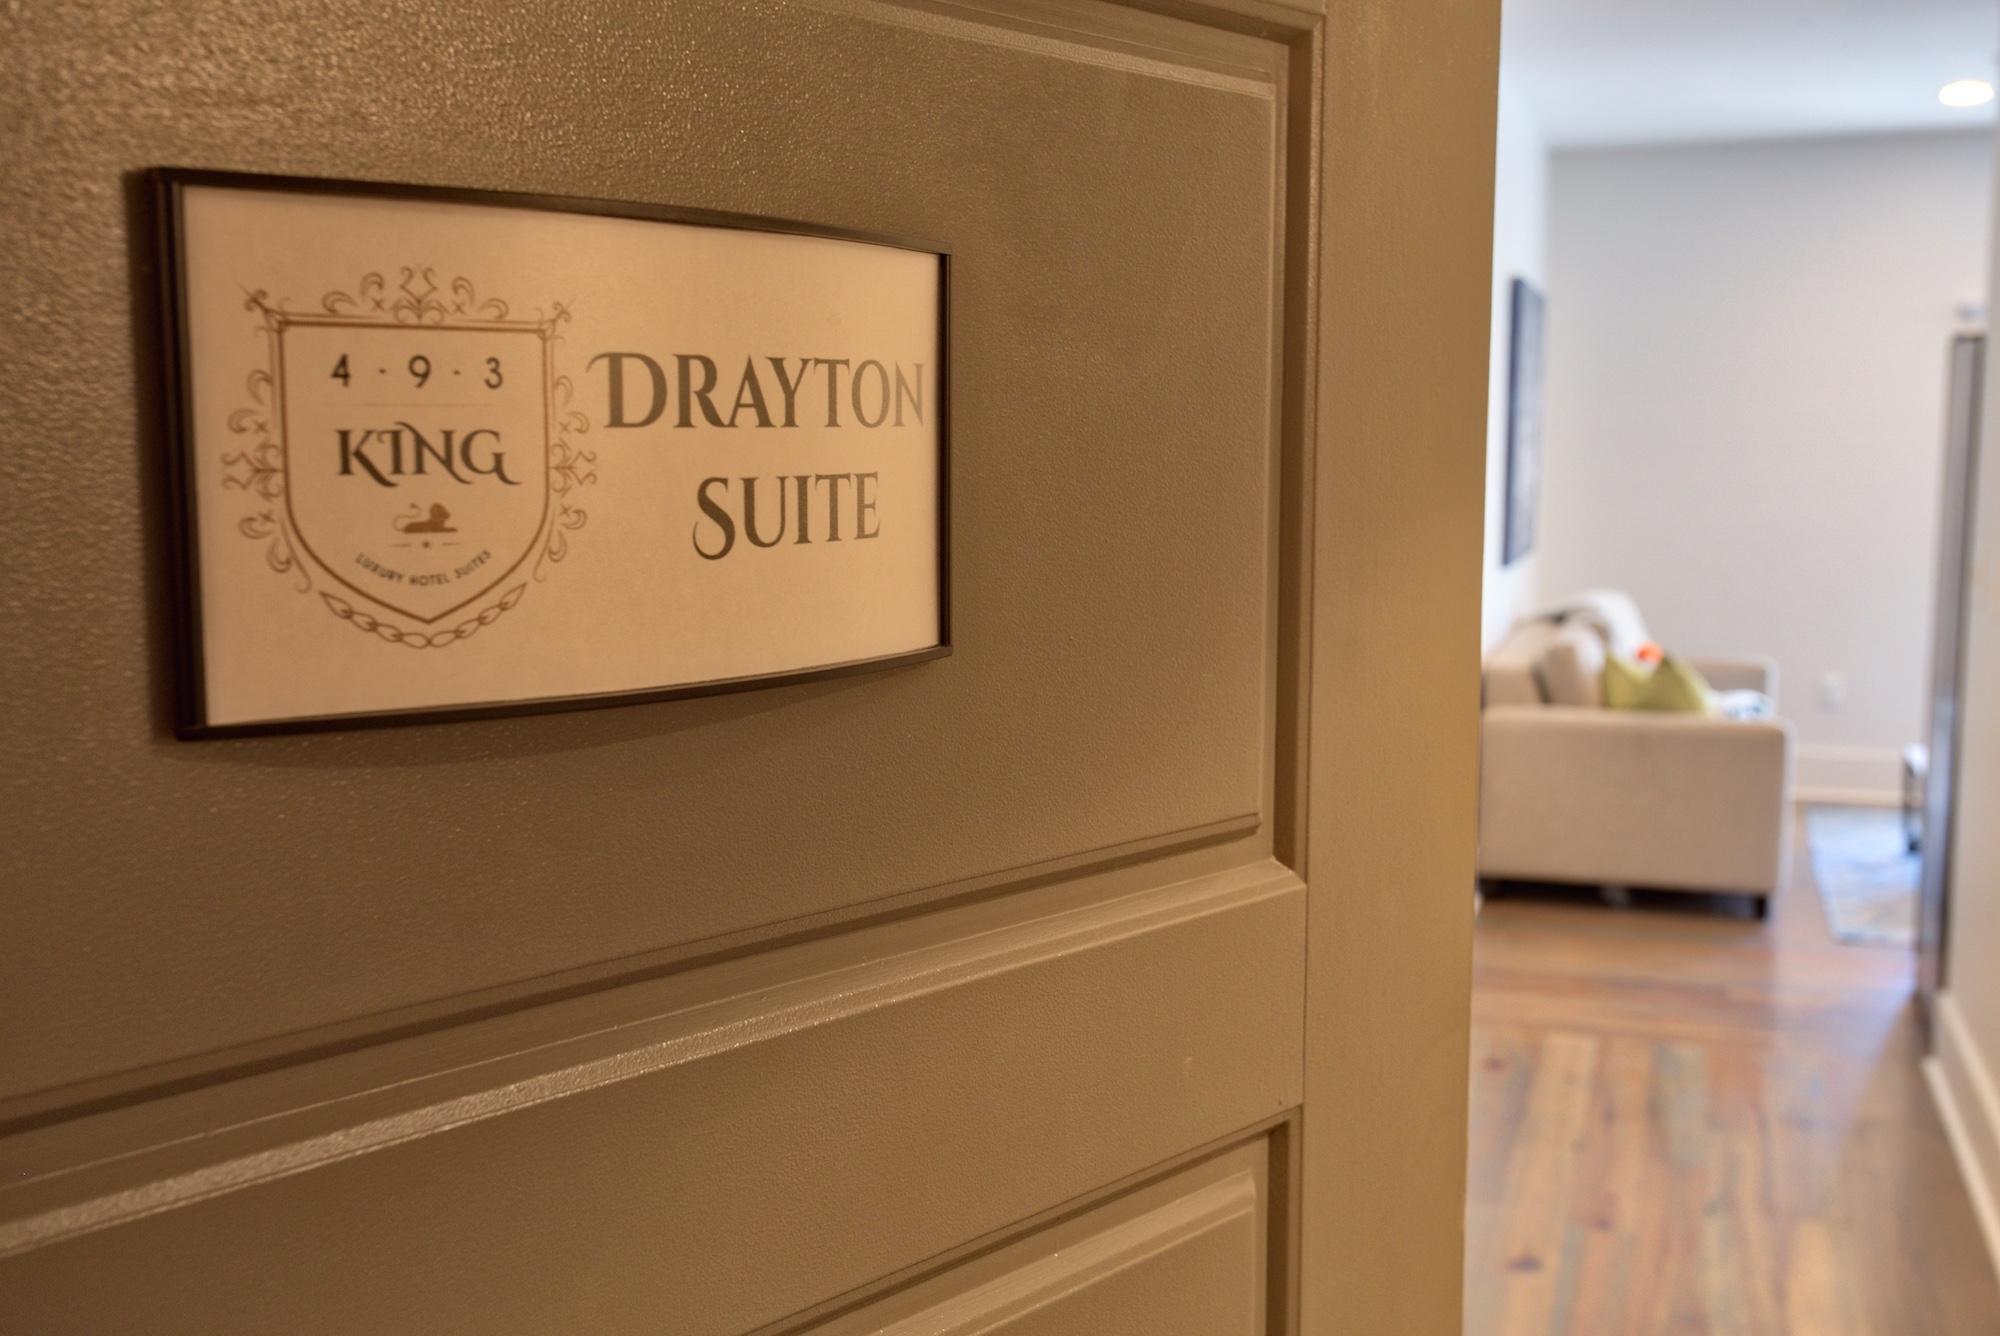 Suite on King Street Charleston SC Vacation Rental The Drayton Suite1.jpeg